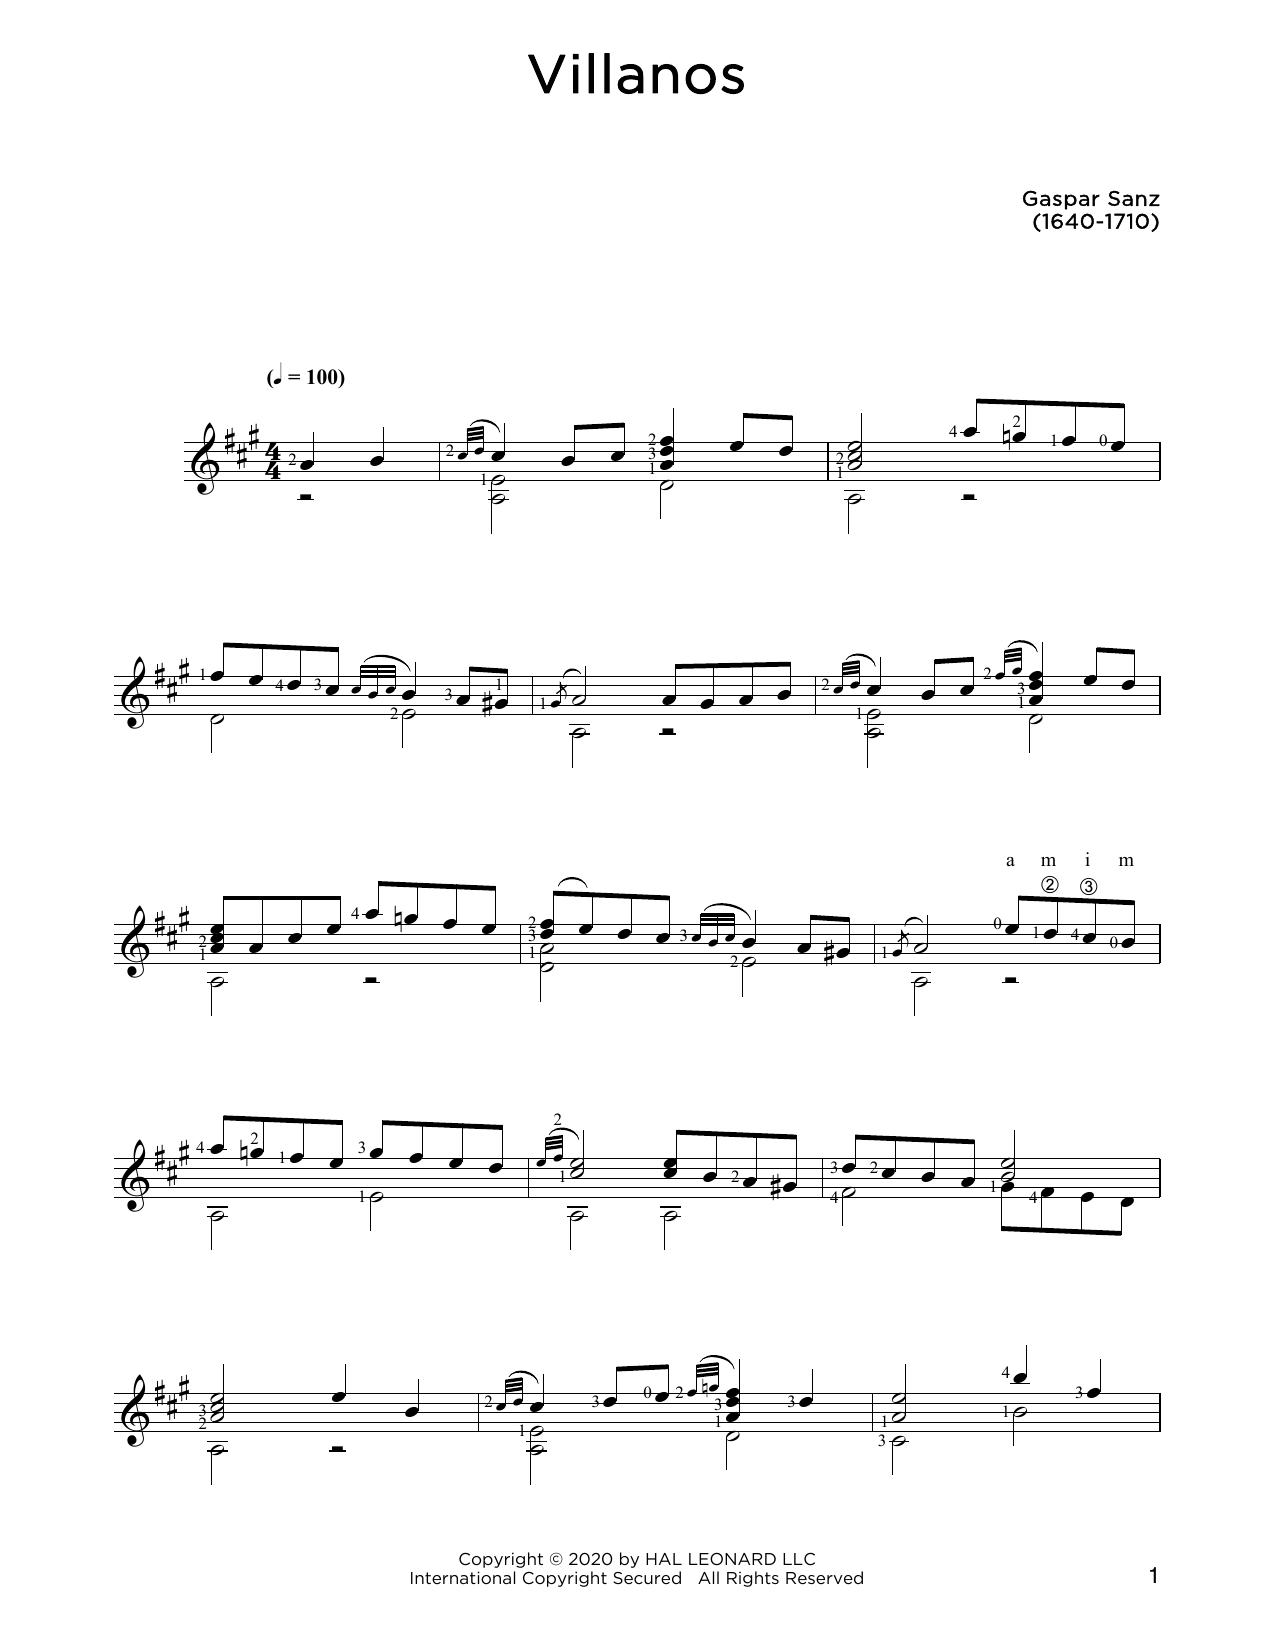 Gaspar Sanz Villanos sheet music notes and chords. Download Printable PDF.